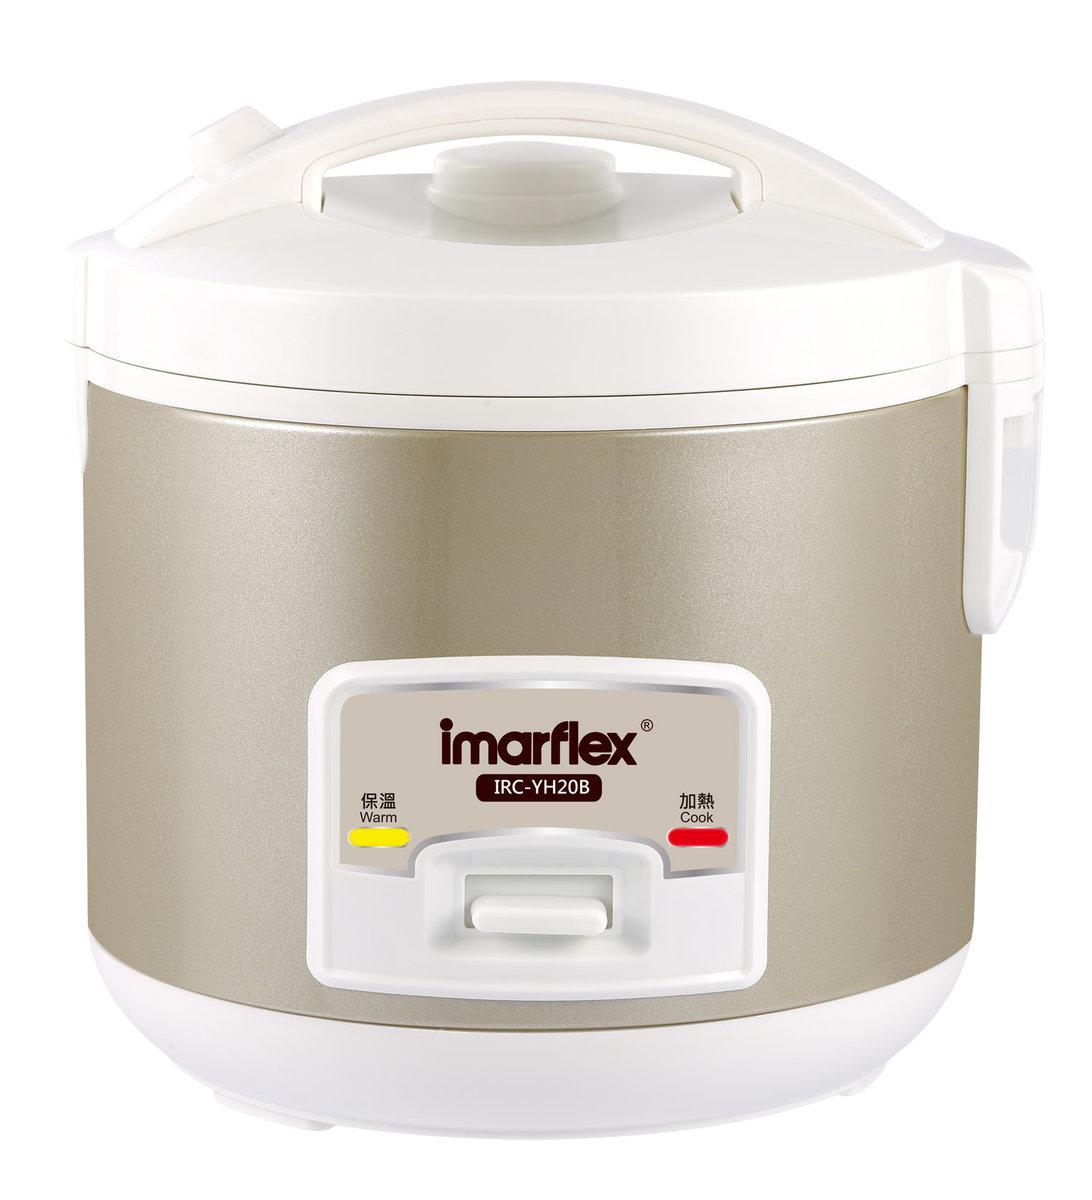 Imarflex Rice Cooker IRC-YH20B